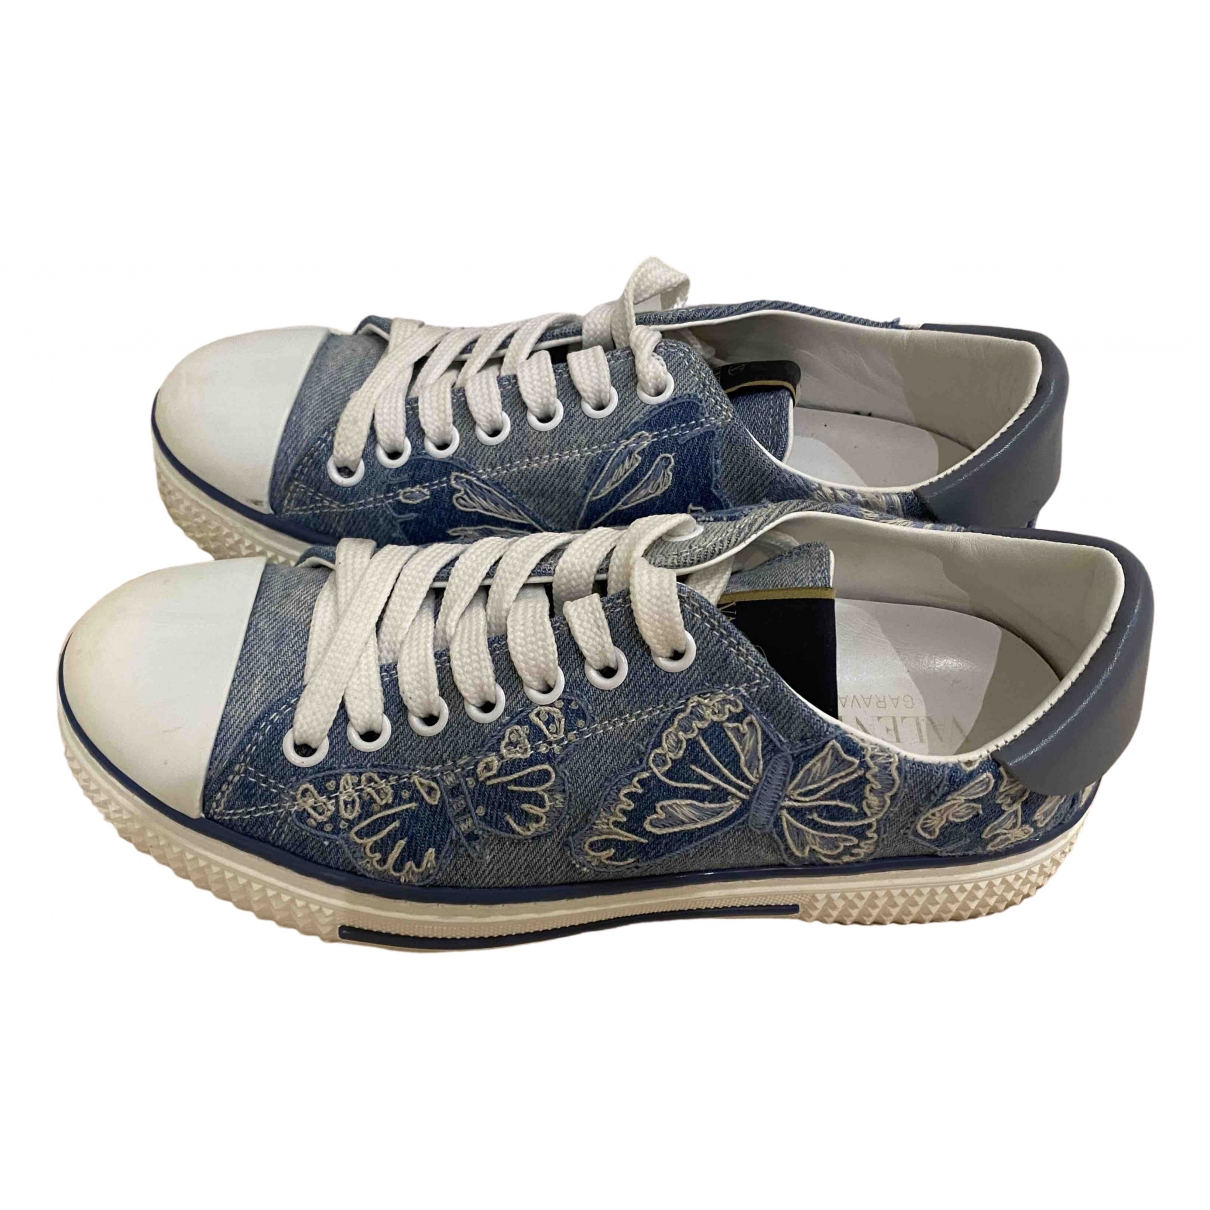 Valentino Garavani \N Sneakers in  Blau Leinen